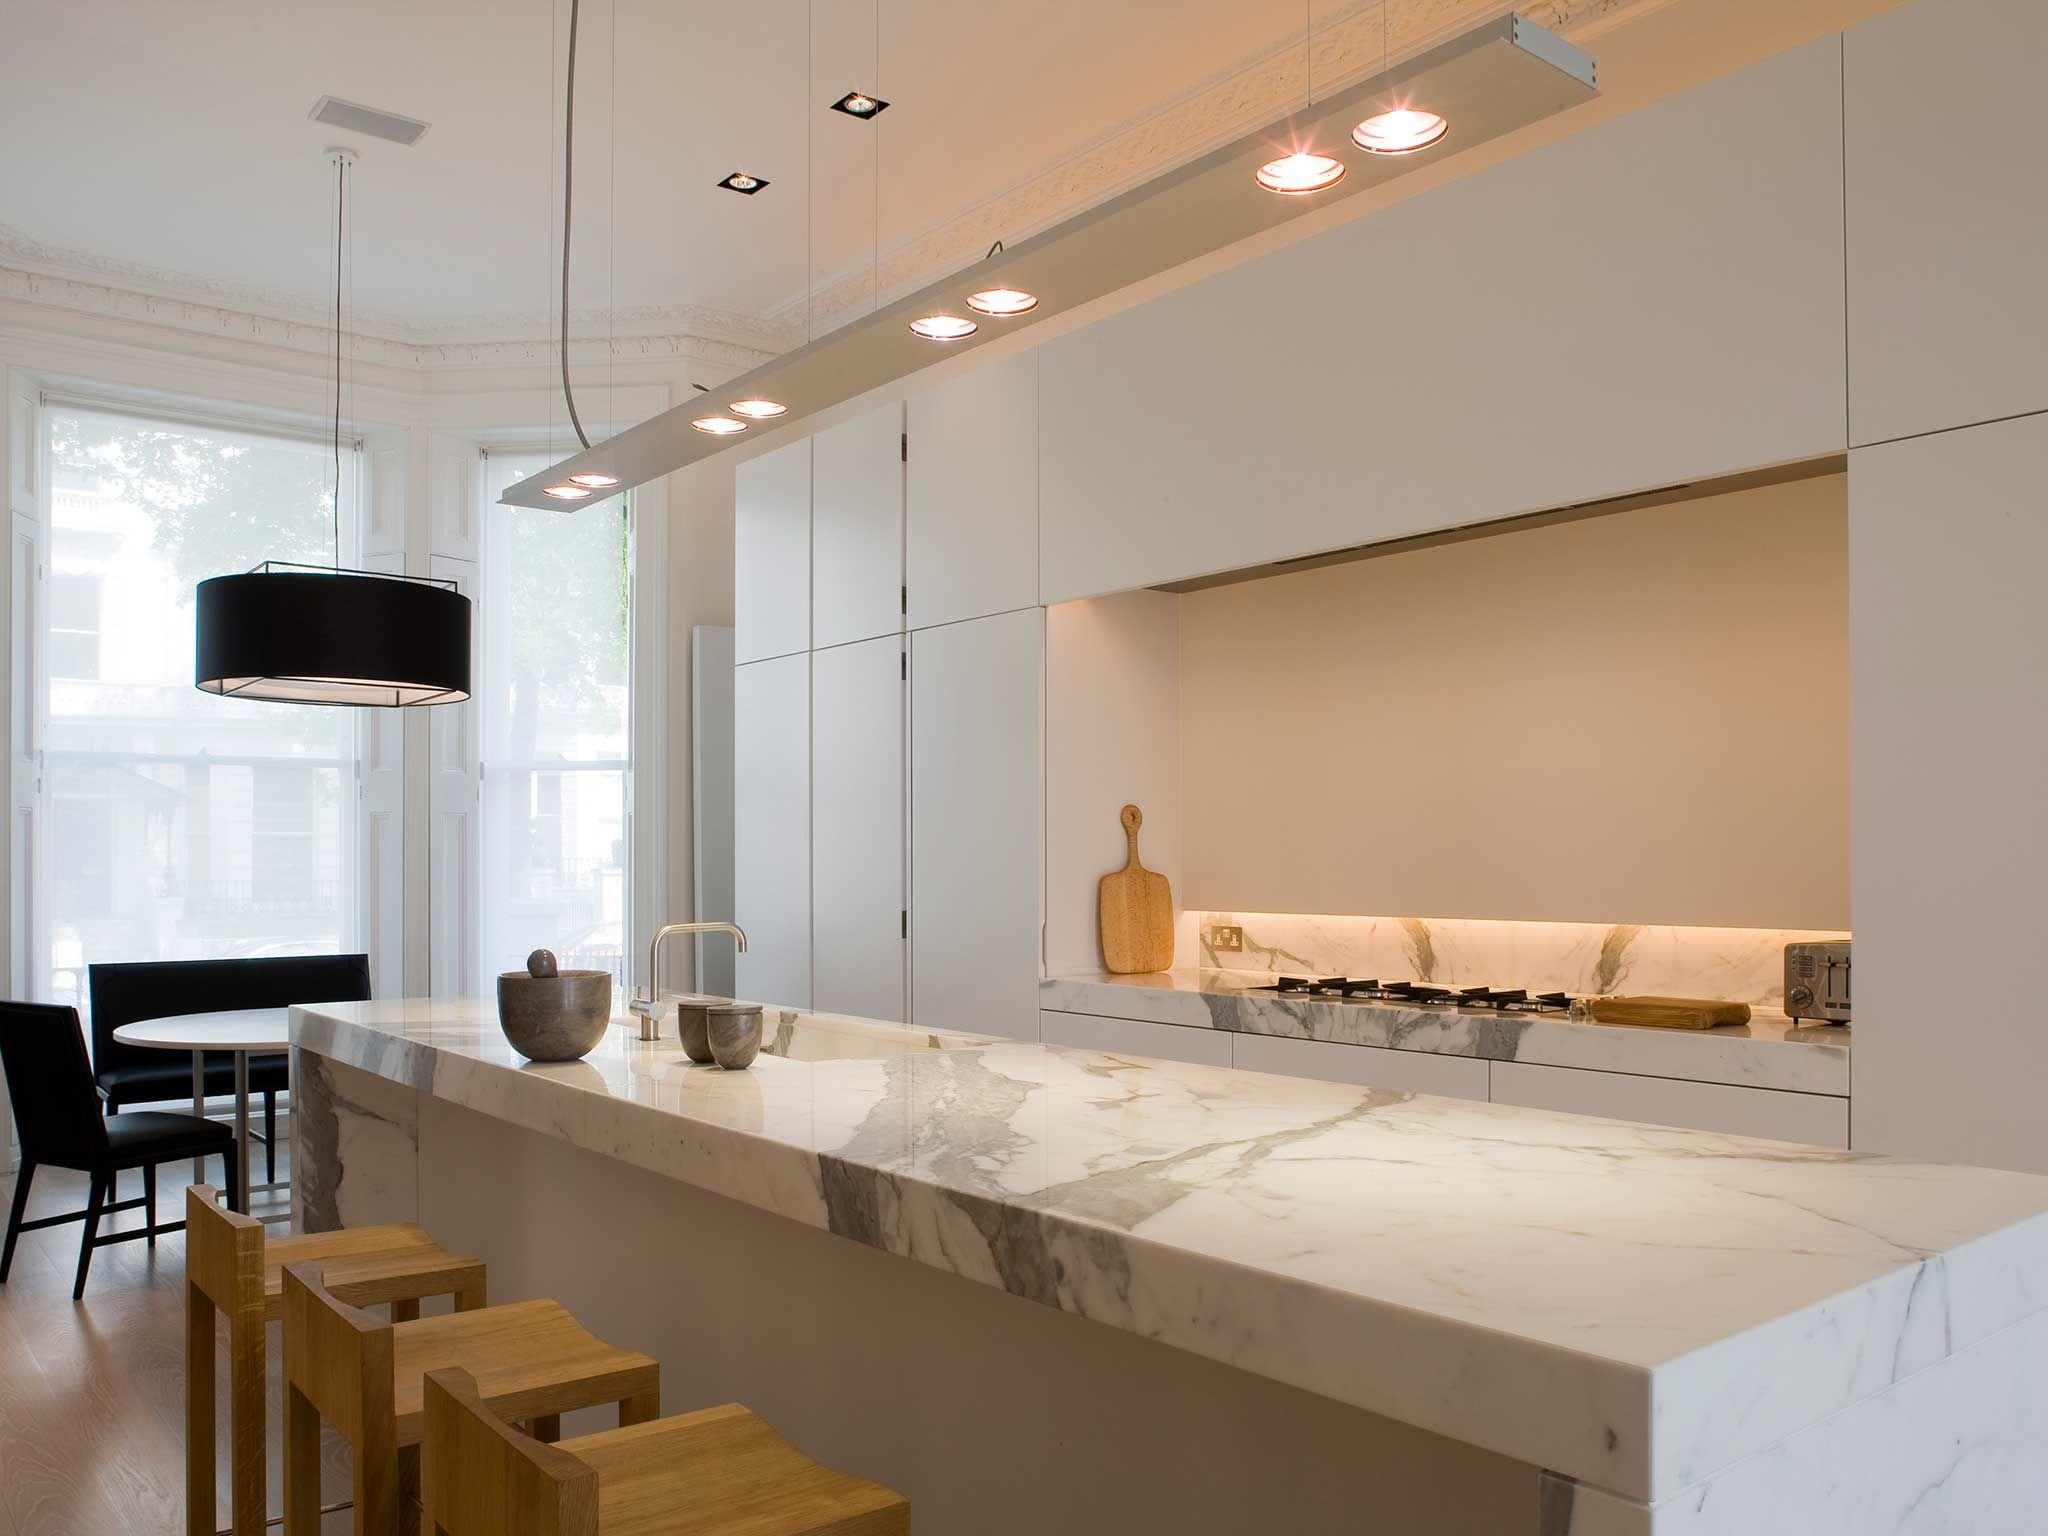 Obumex minimalistic kitchen kitchen island marble white